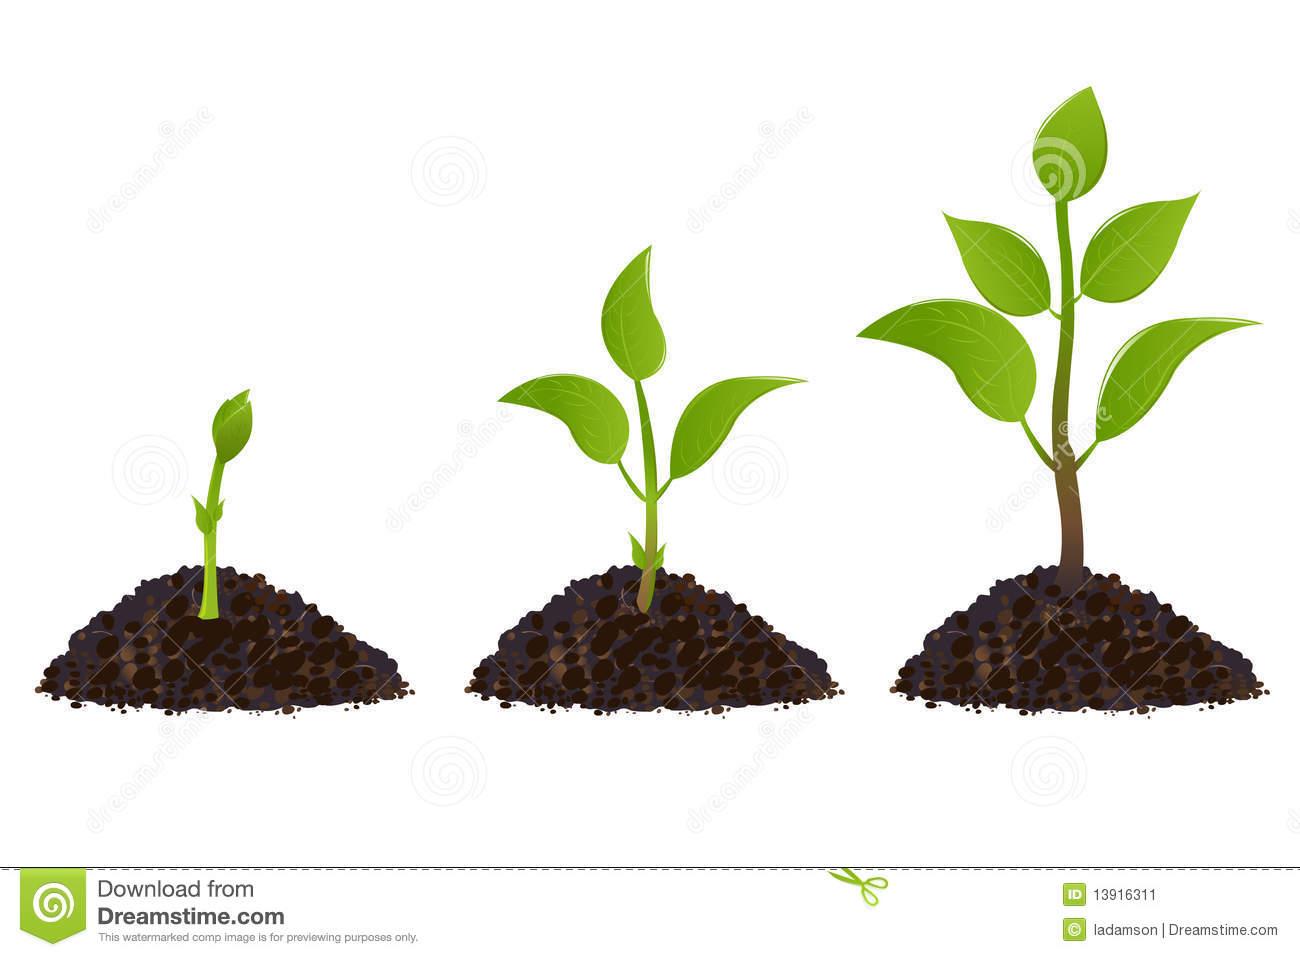 Plant Life Processes